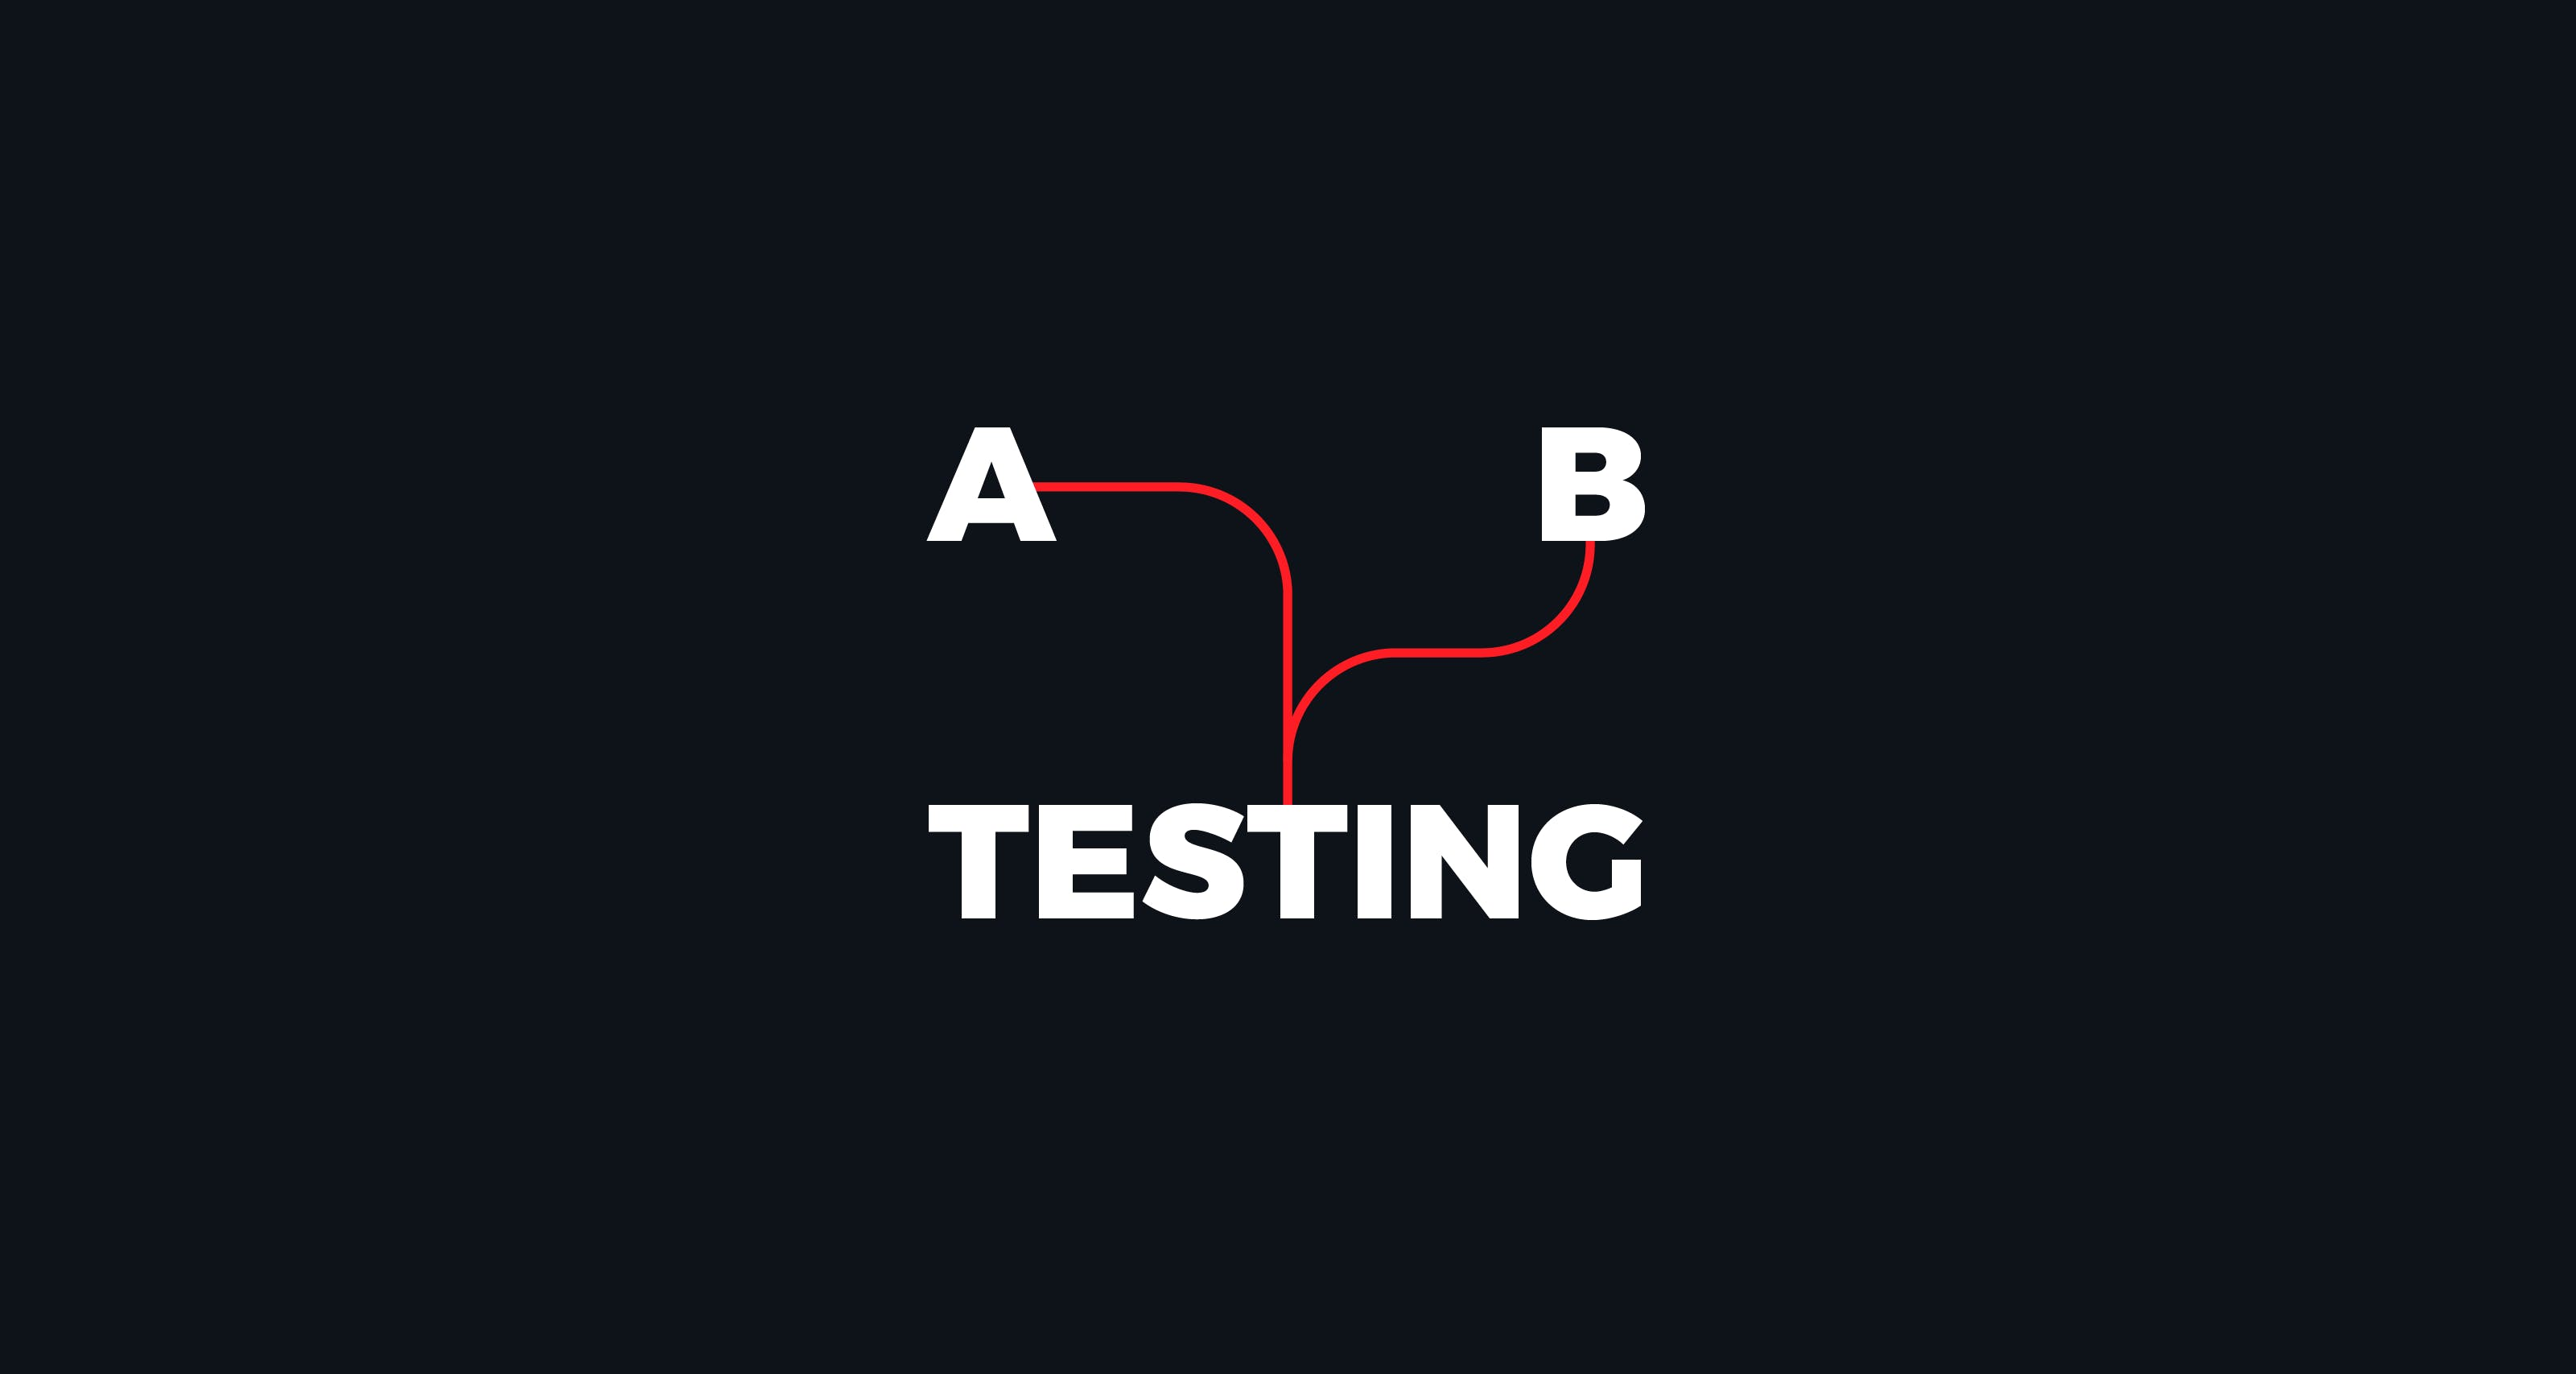 A/B-testning